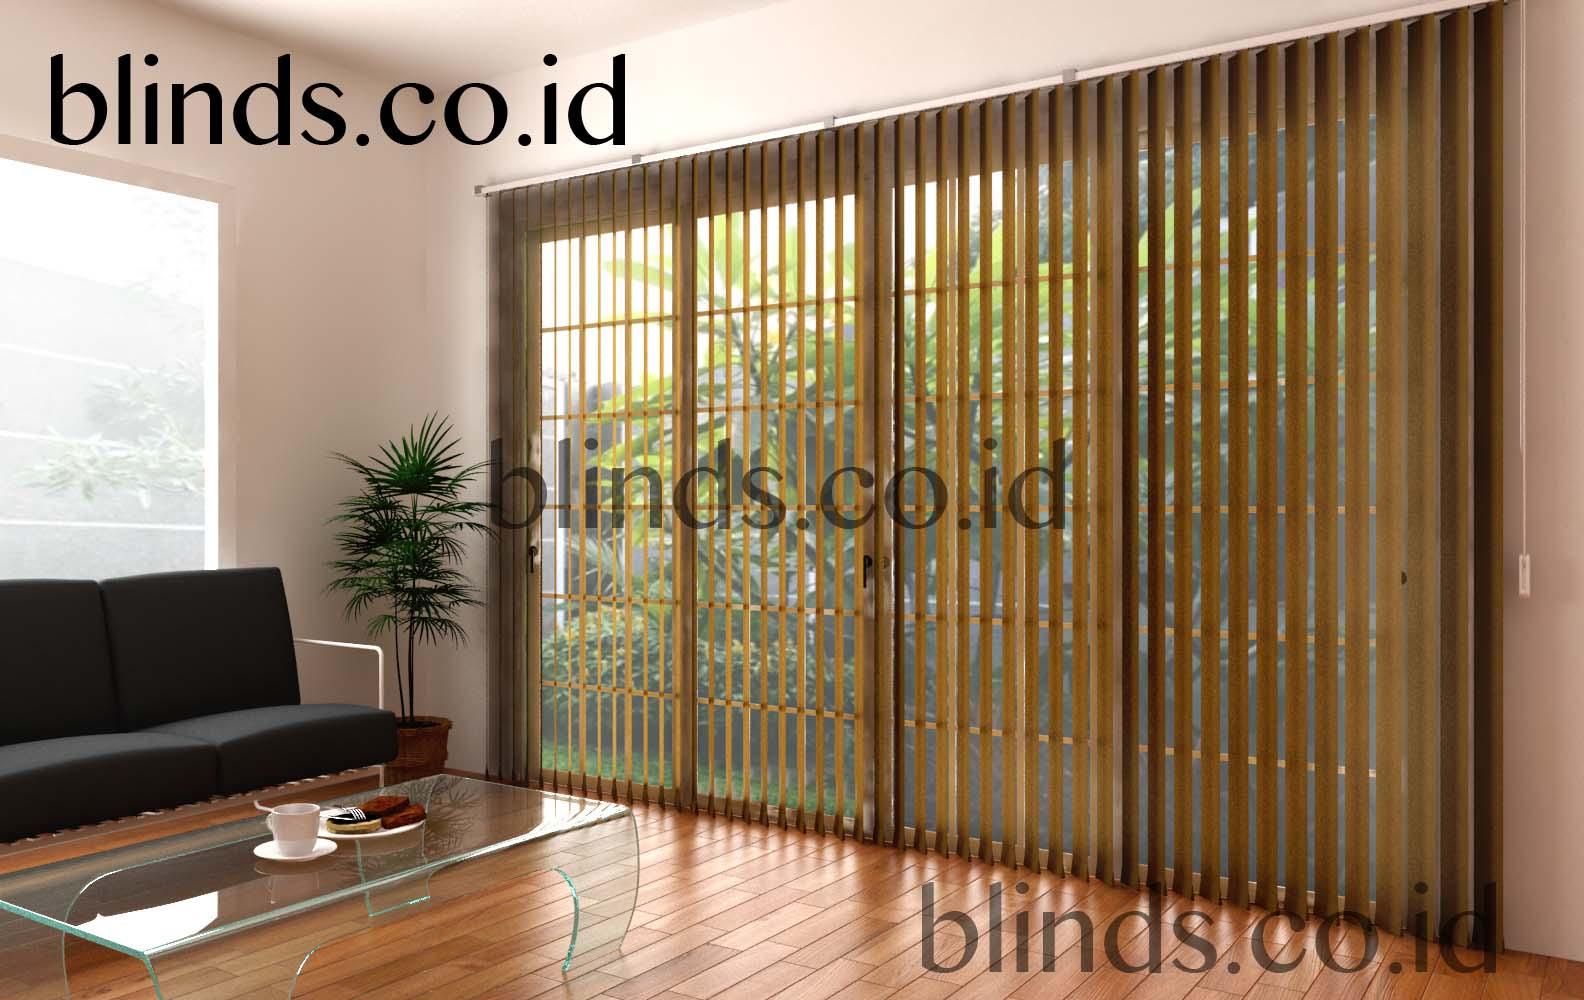 vertical blinds sharp point SP 8008 - 7 BEIGE